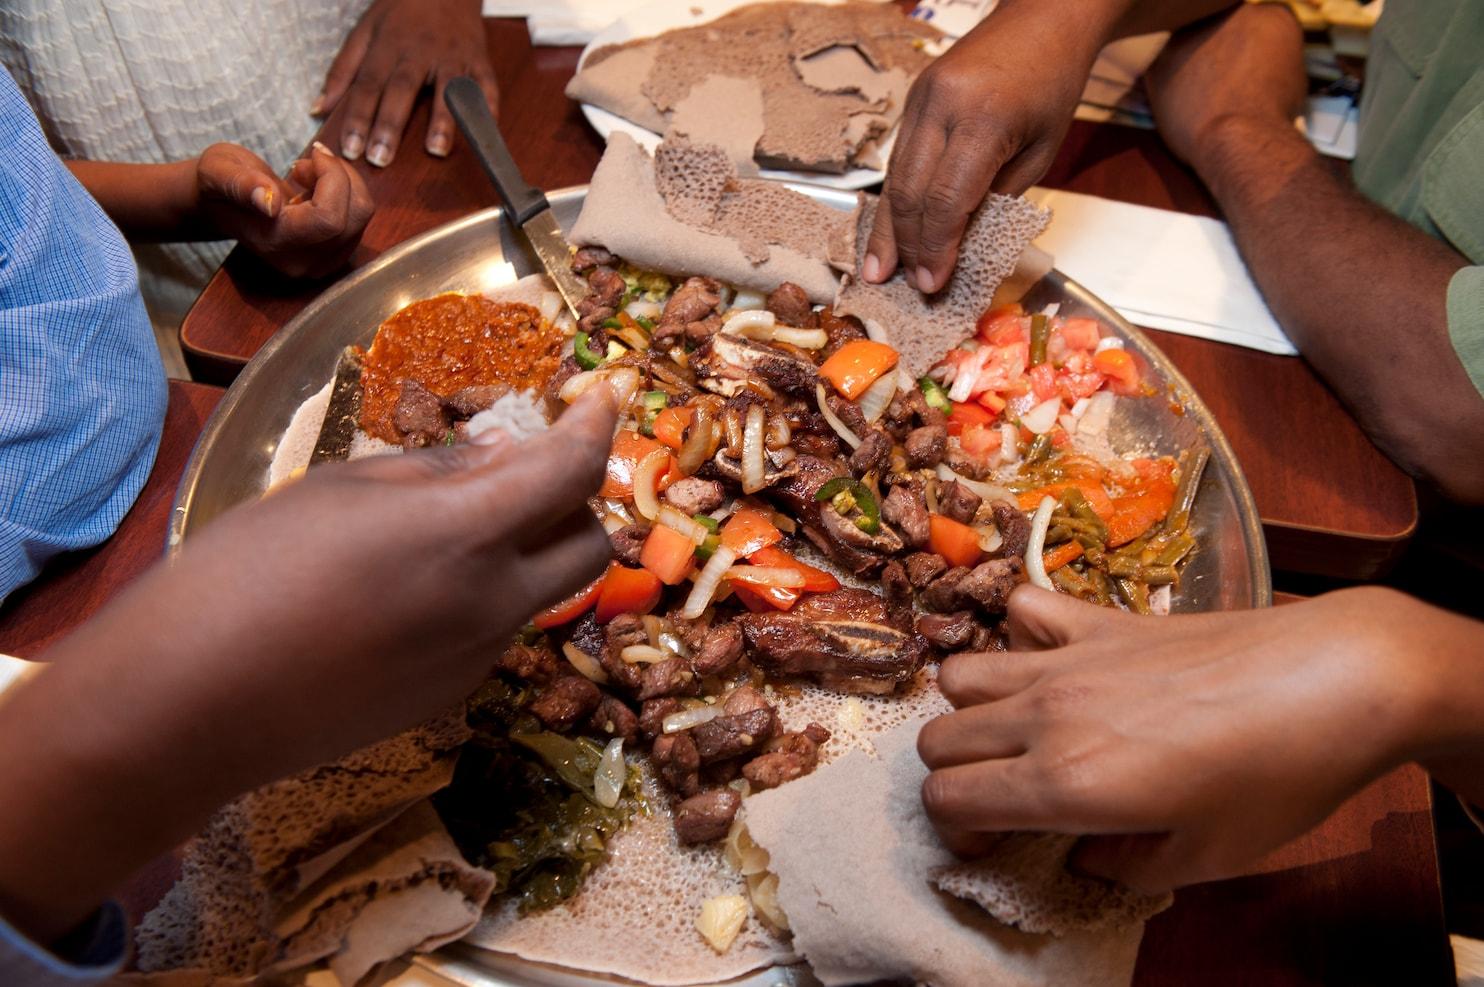 As Americans embrace Ethiopian cuisine its farmers grow more teff  The Washington Post